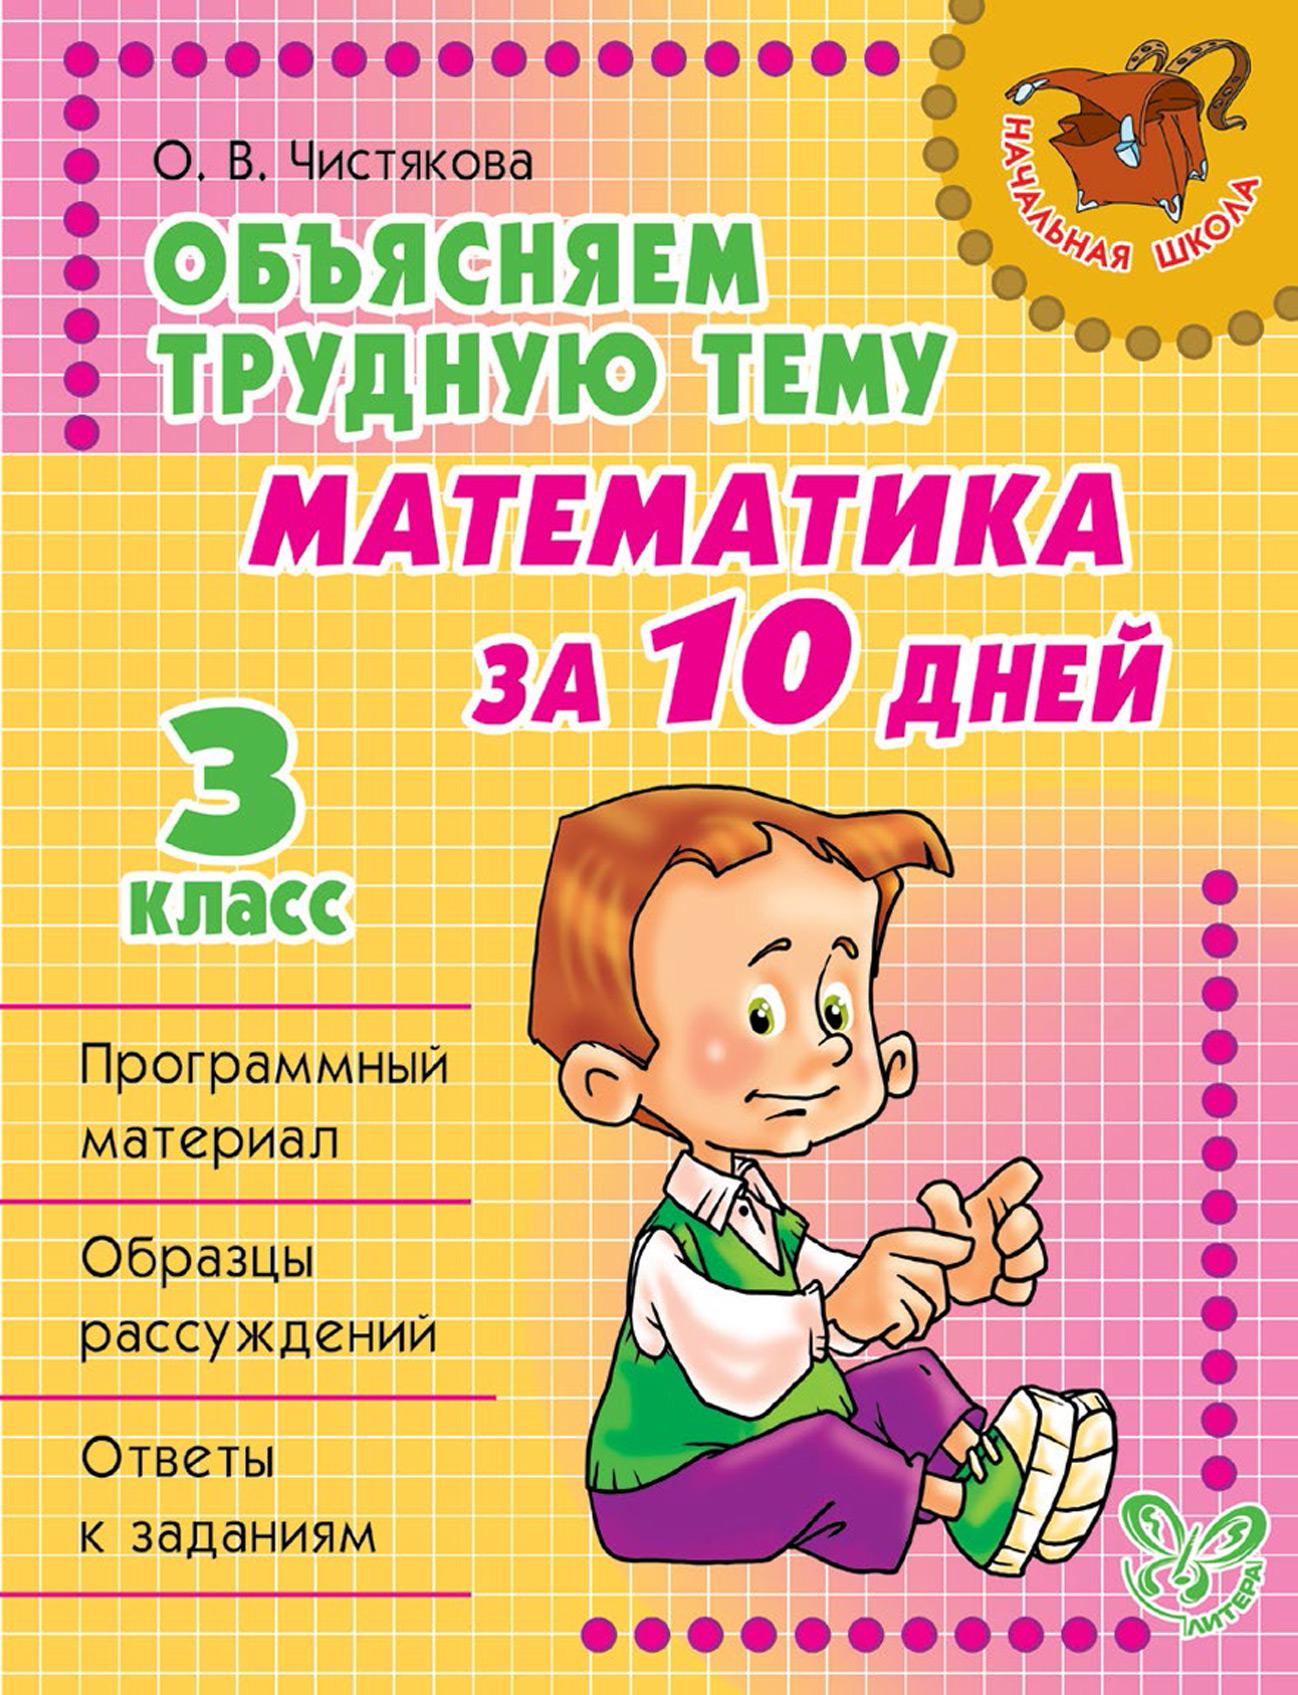 О. В. Чистякова Объясняем трудную тему. Математика за 10 дней. 3 класс о в чистякова математика за 10 дней 3 класс